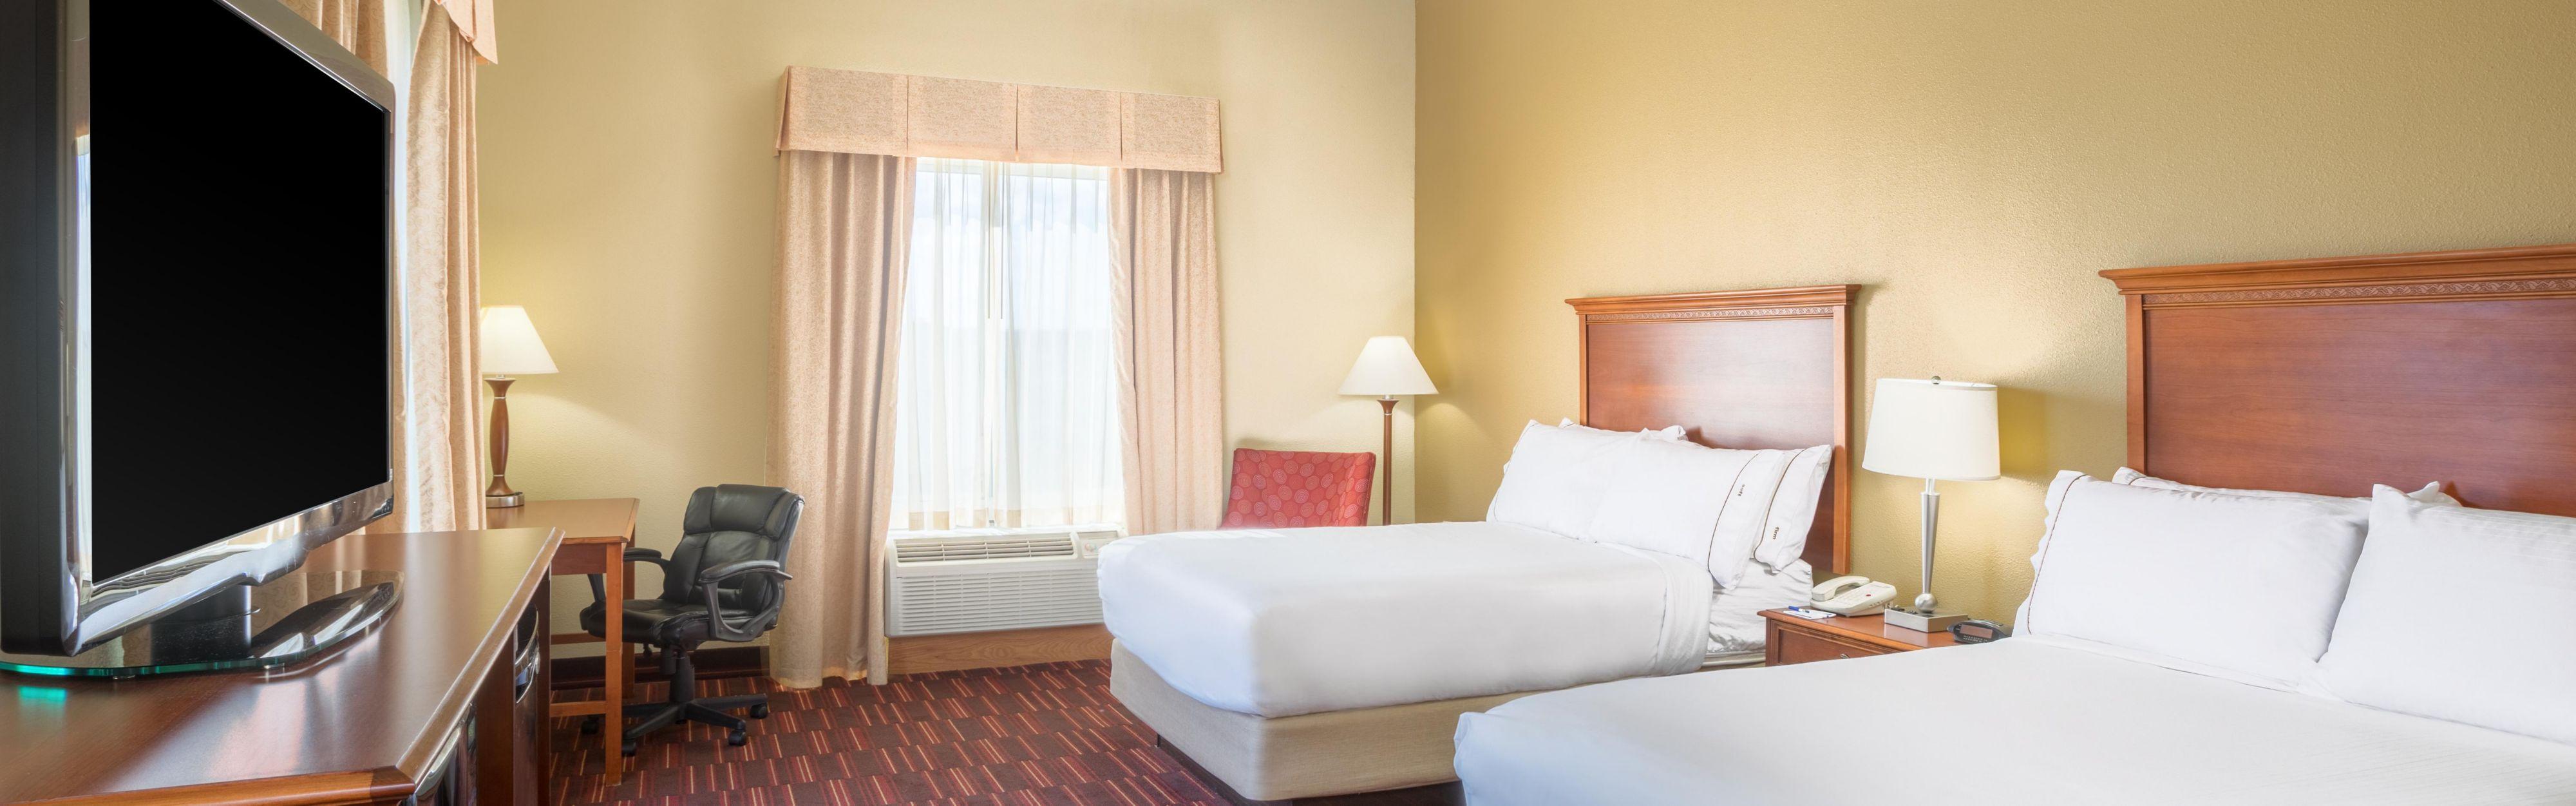 Holiday Inn Express & Suites Woodbridge image 1